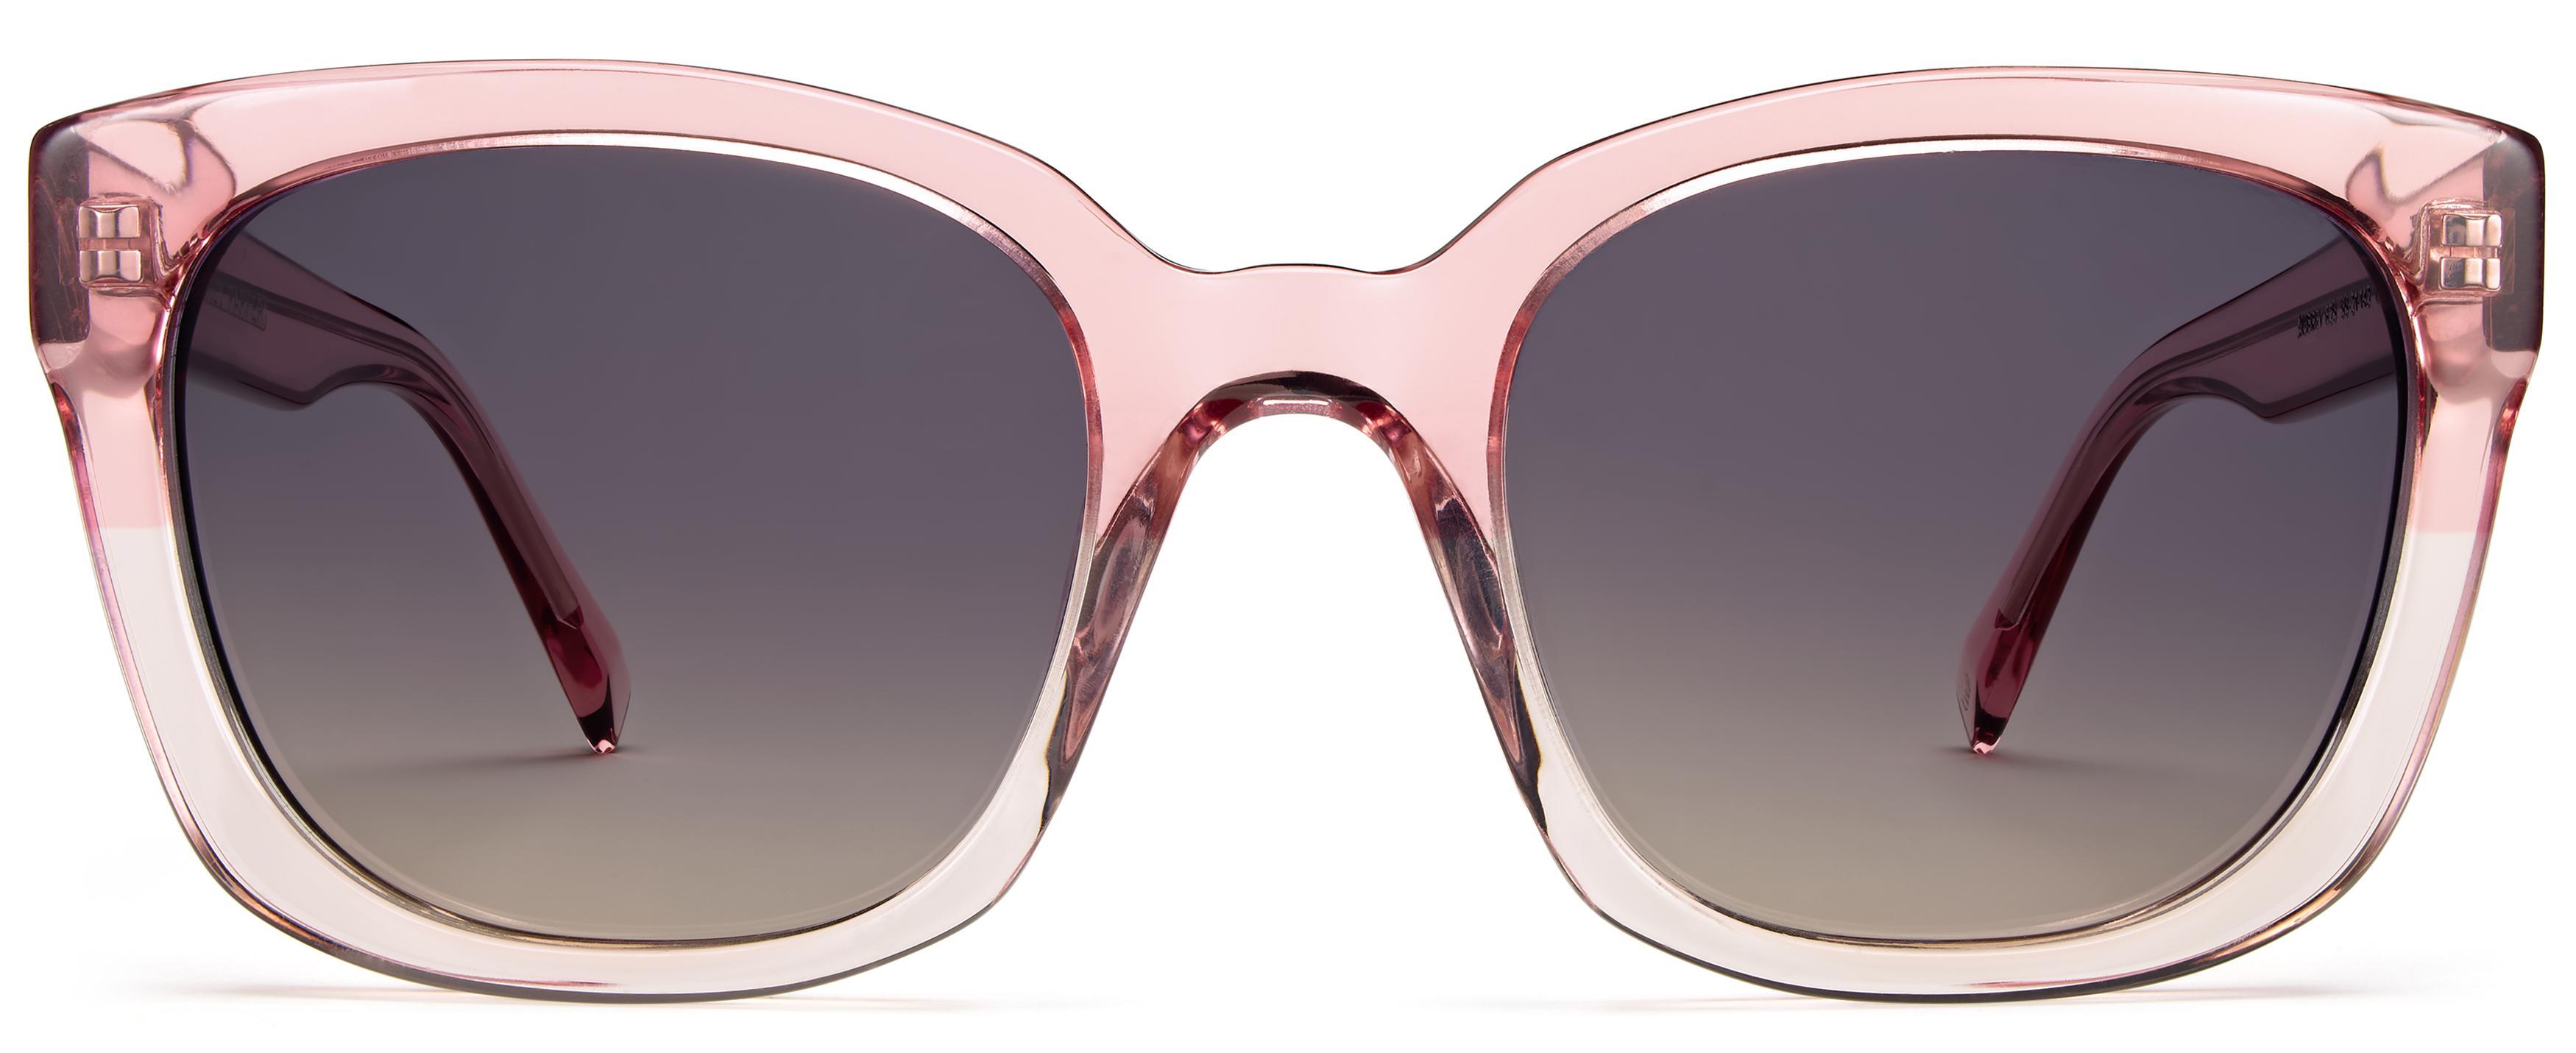 327319fde Women's Sunglasses   Warby Parker